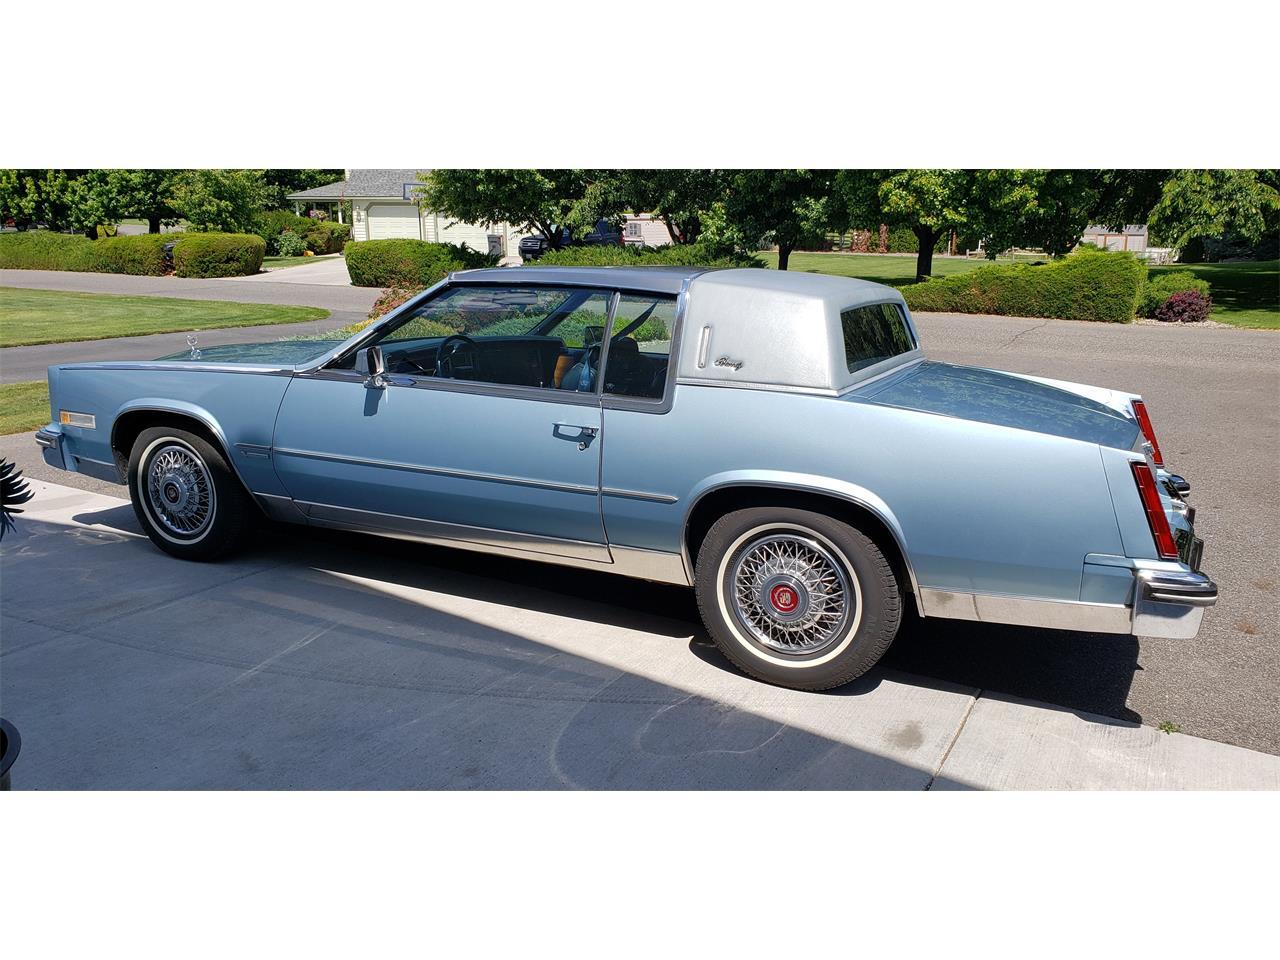 1981 cadillac eldorado biarritz for sale classiccars com cc 1252061 1981 cadillac eldorado biarritz for